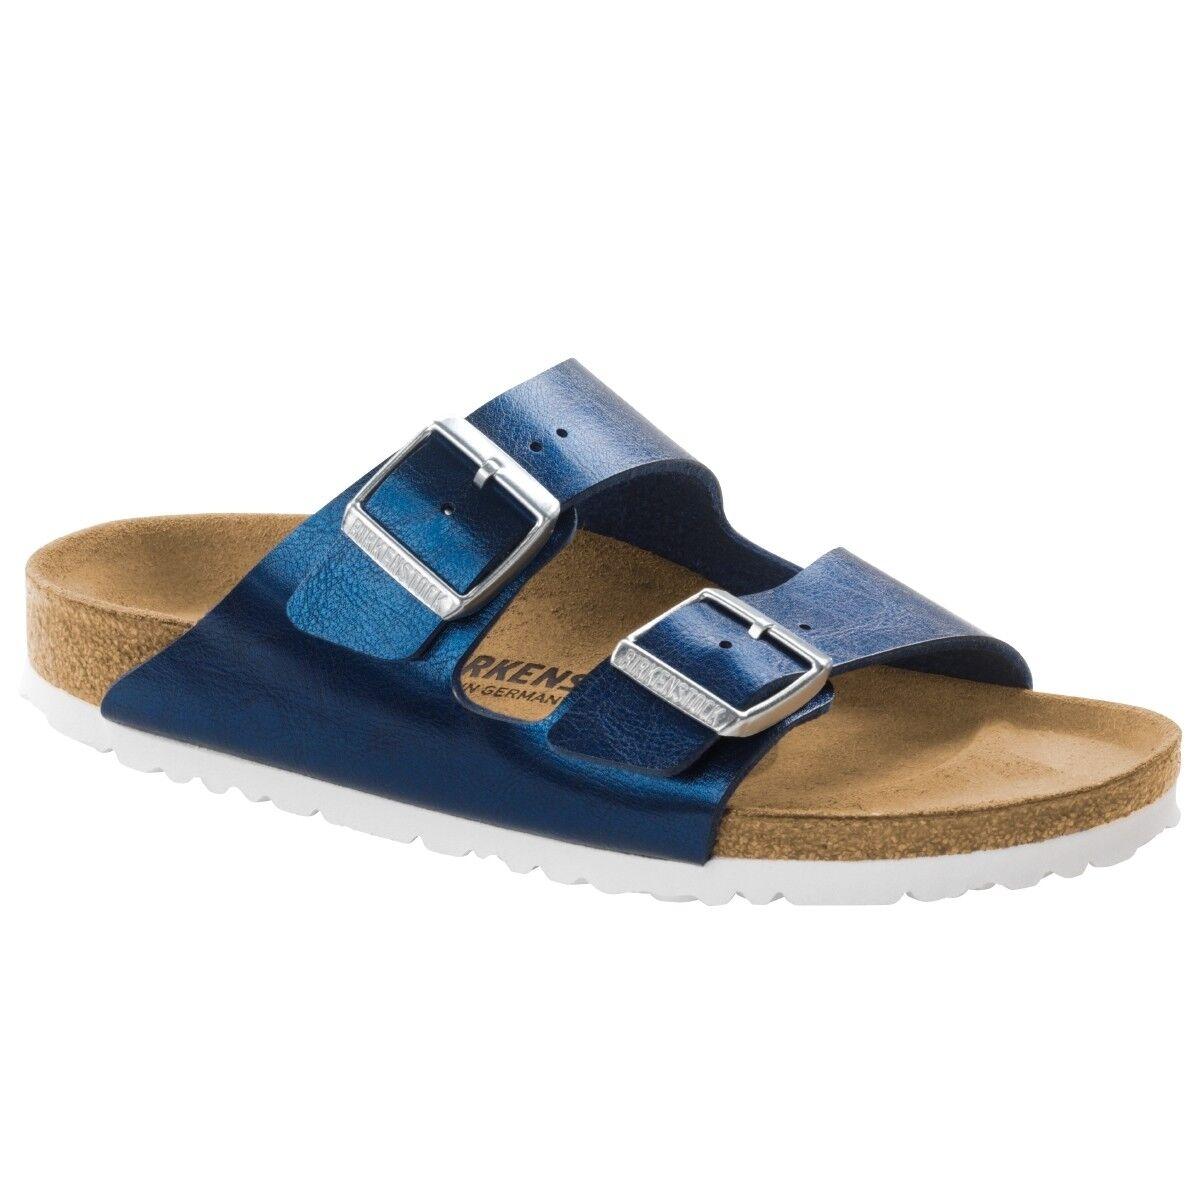 Birkenstock Arizona Birko-Flor Graceful Schuhe Sandalen Weite schmal 1006375